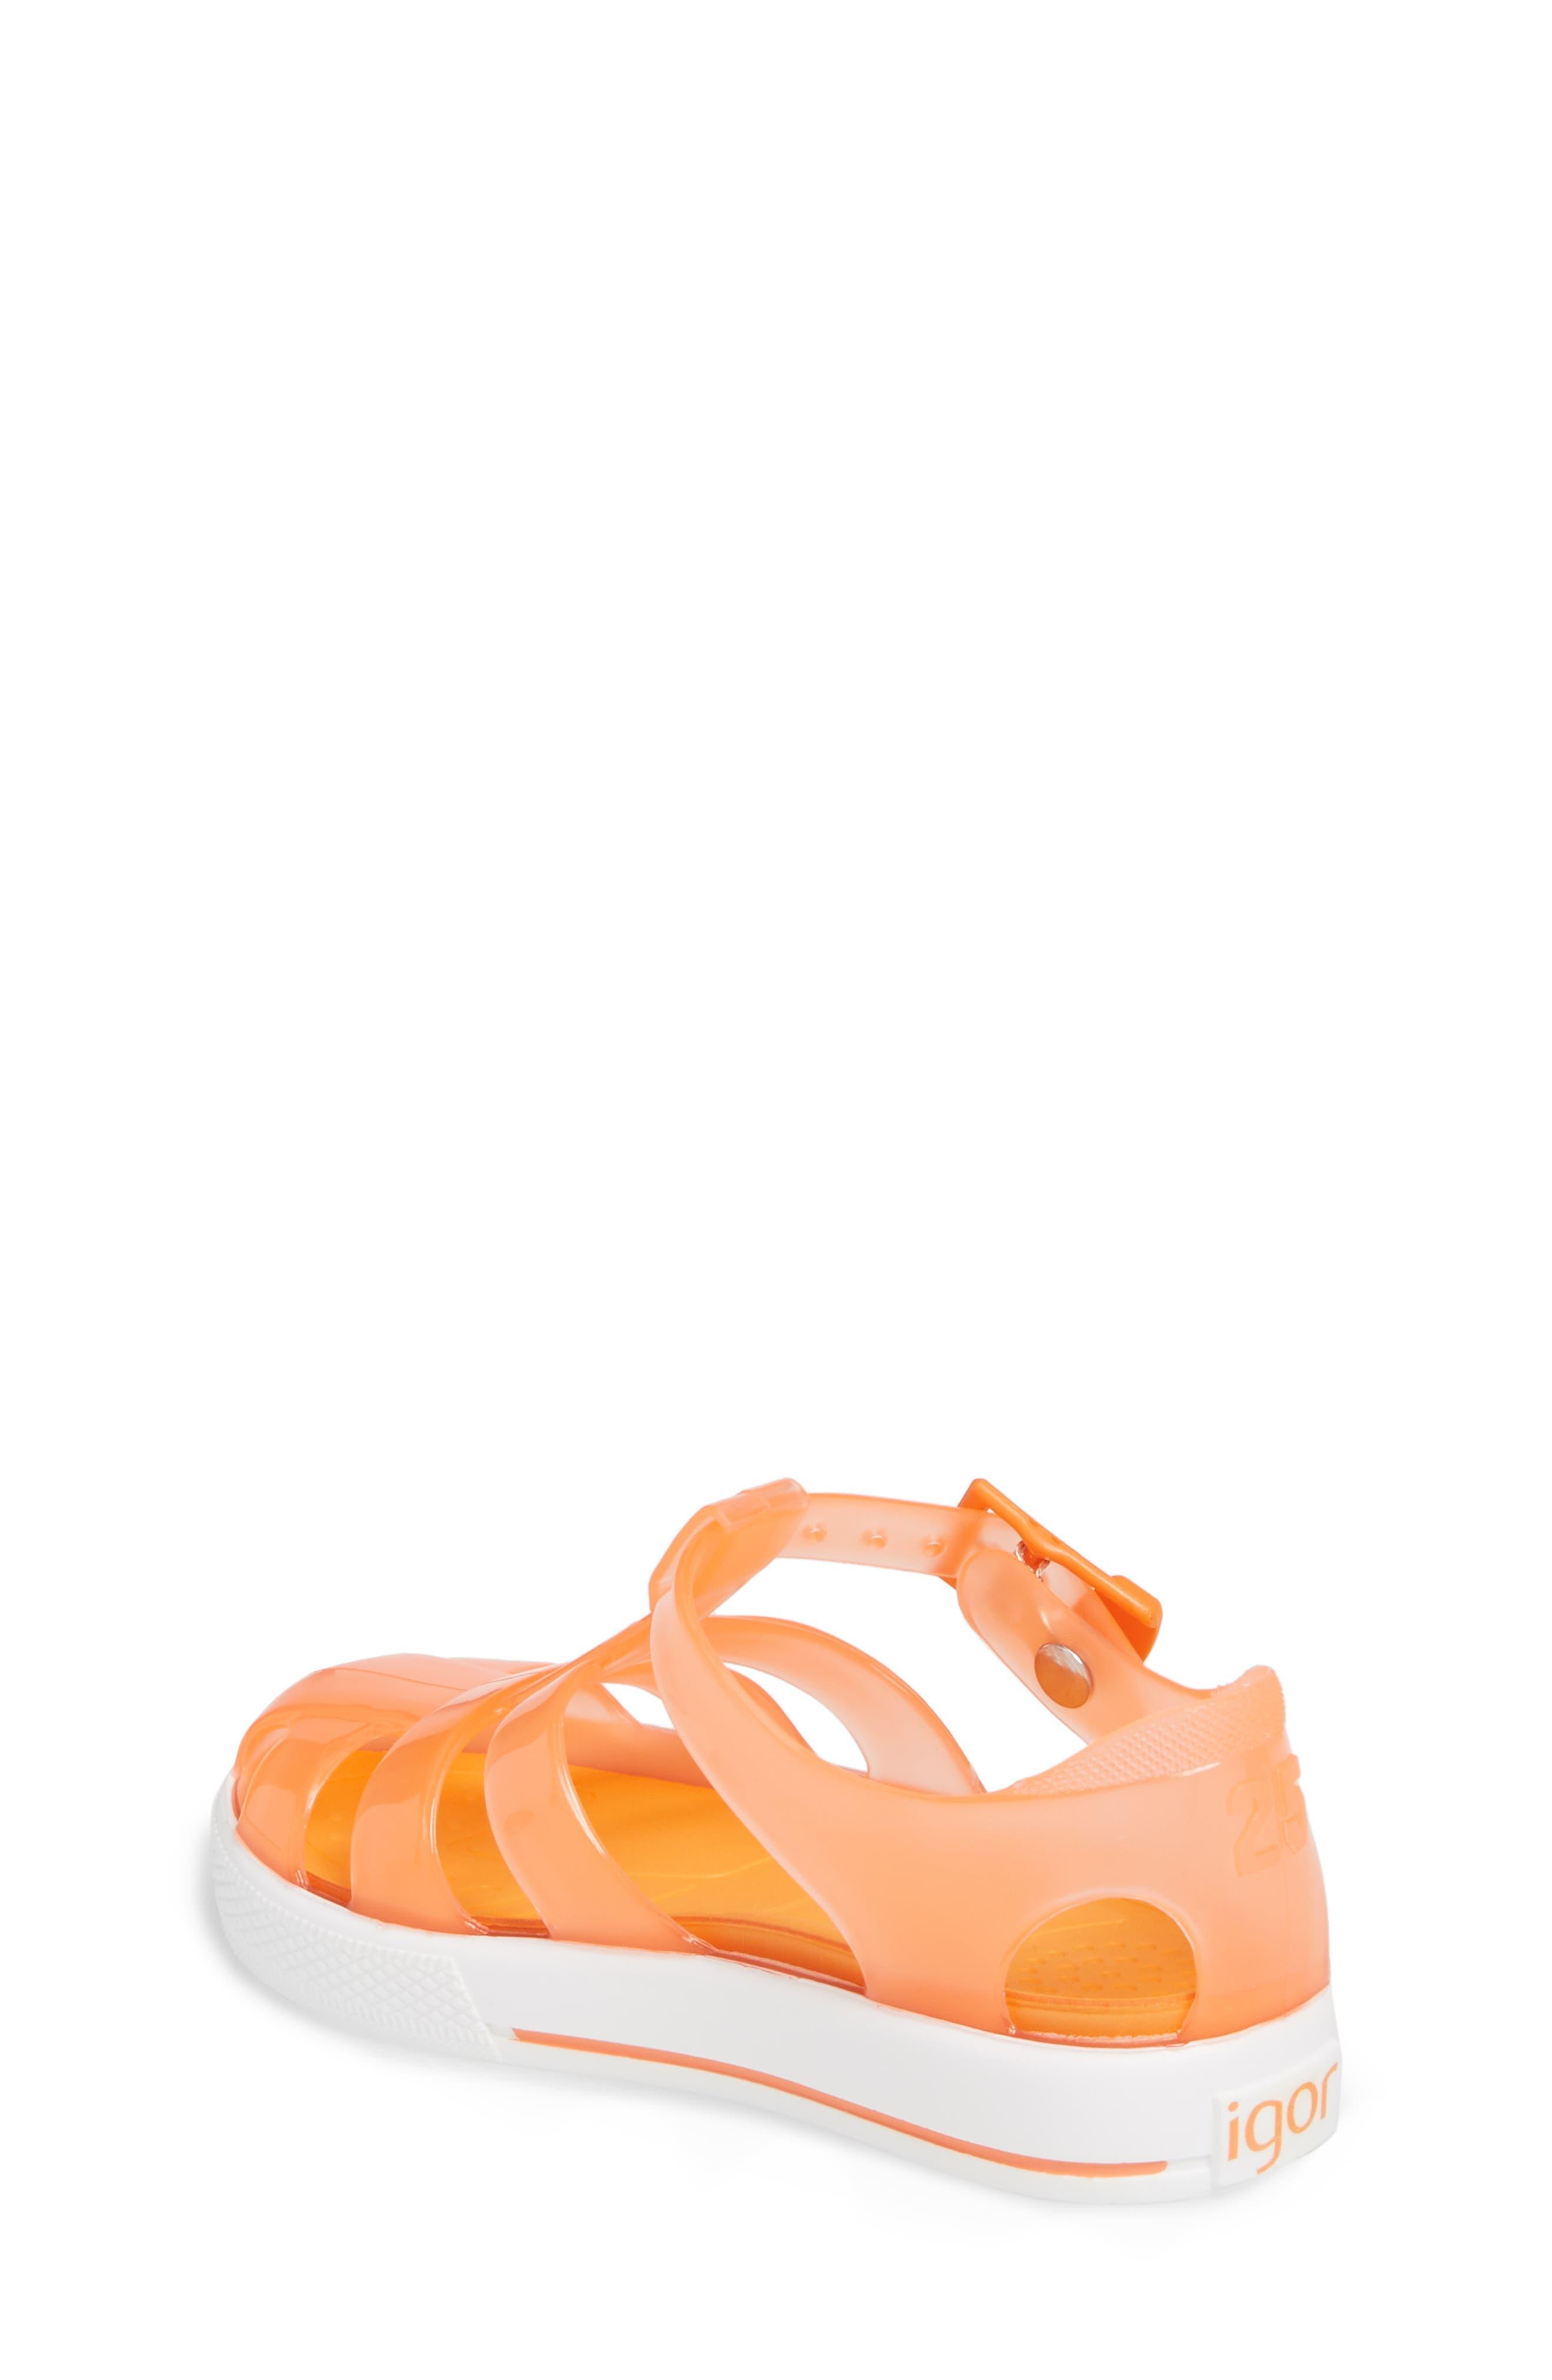 Tenis Fisherman Jelly Sandal,                             Alternate thumbnail 2, color,                             Crystal Neon Orange